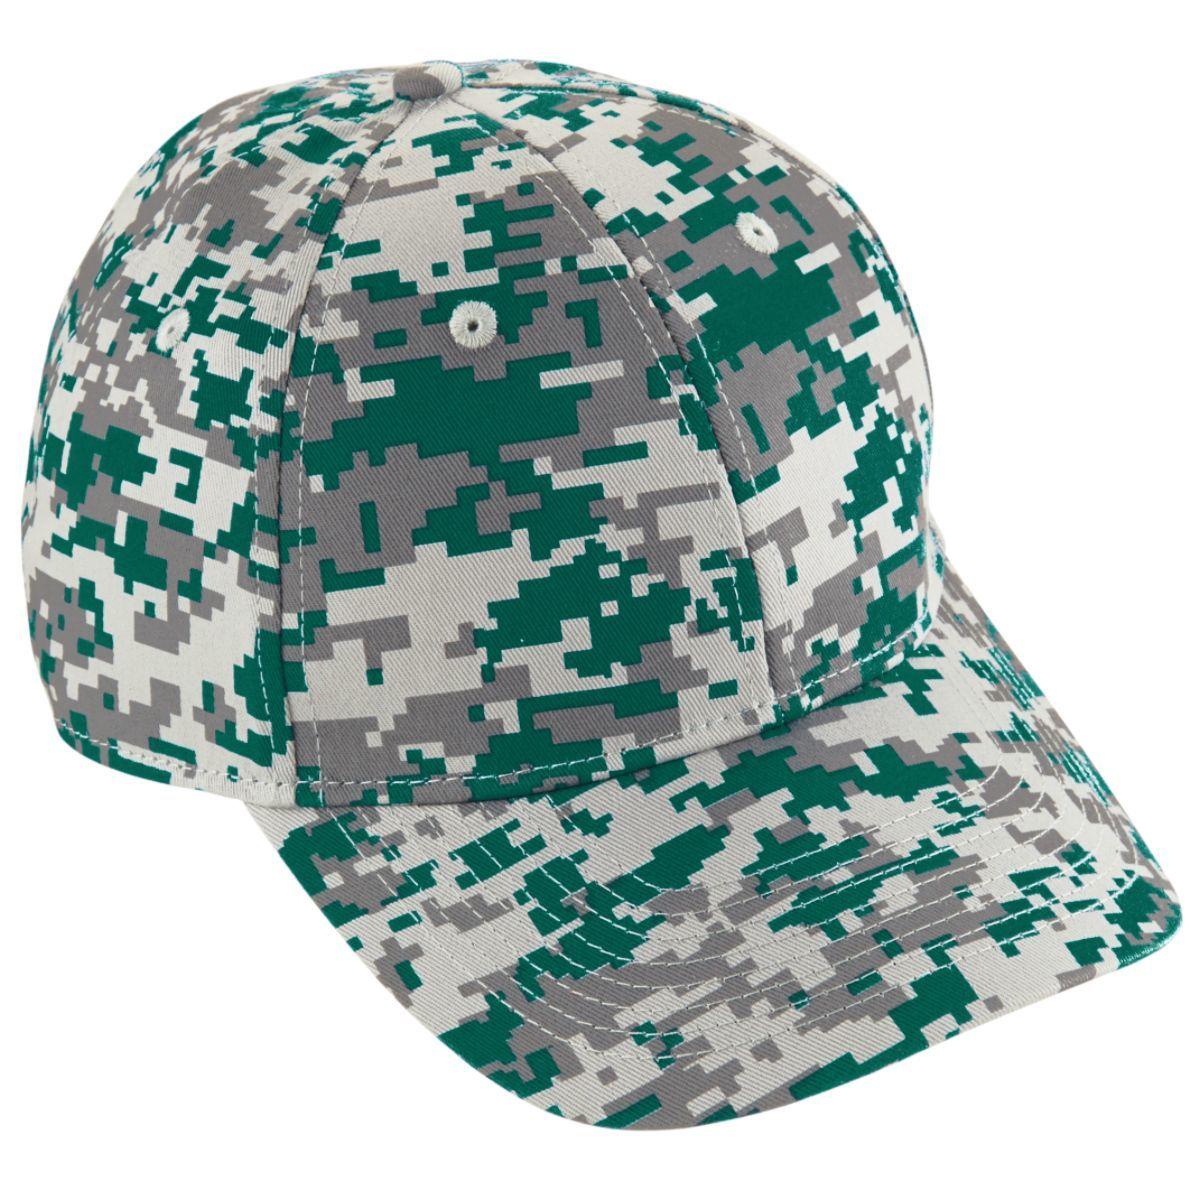 Youth Digi Camo Cotton Twill Cap - Dark Green Digi